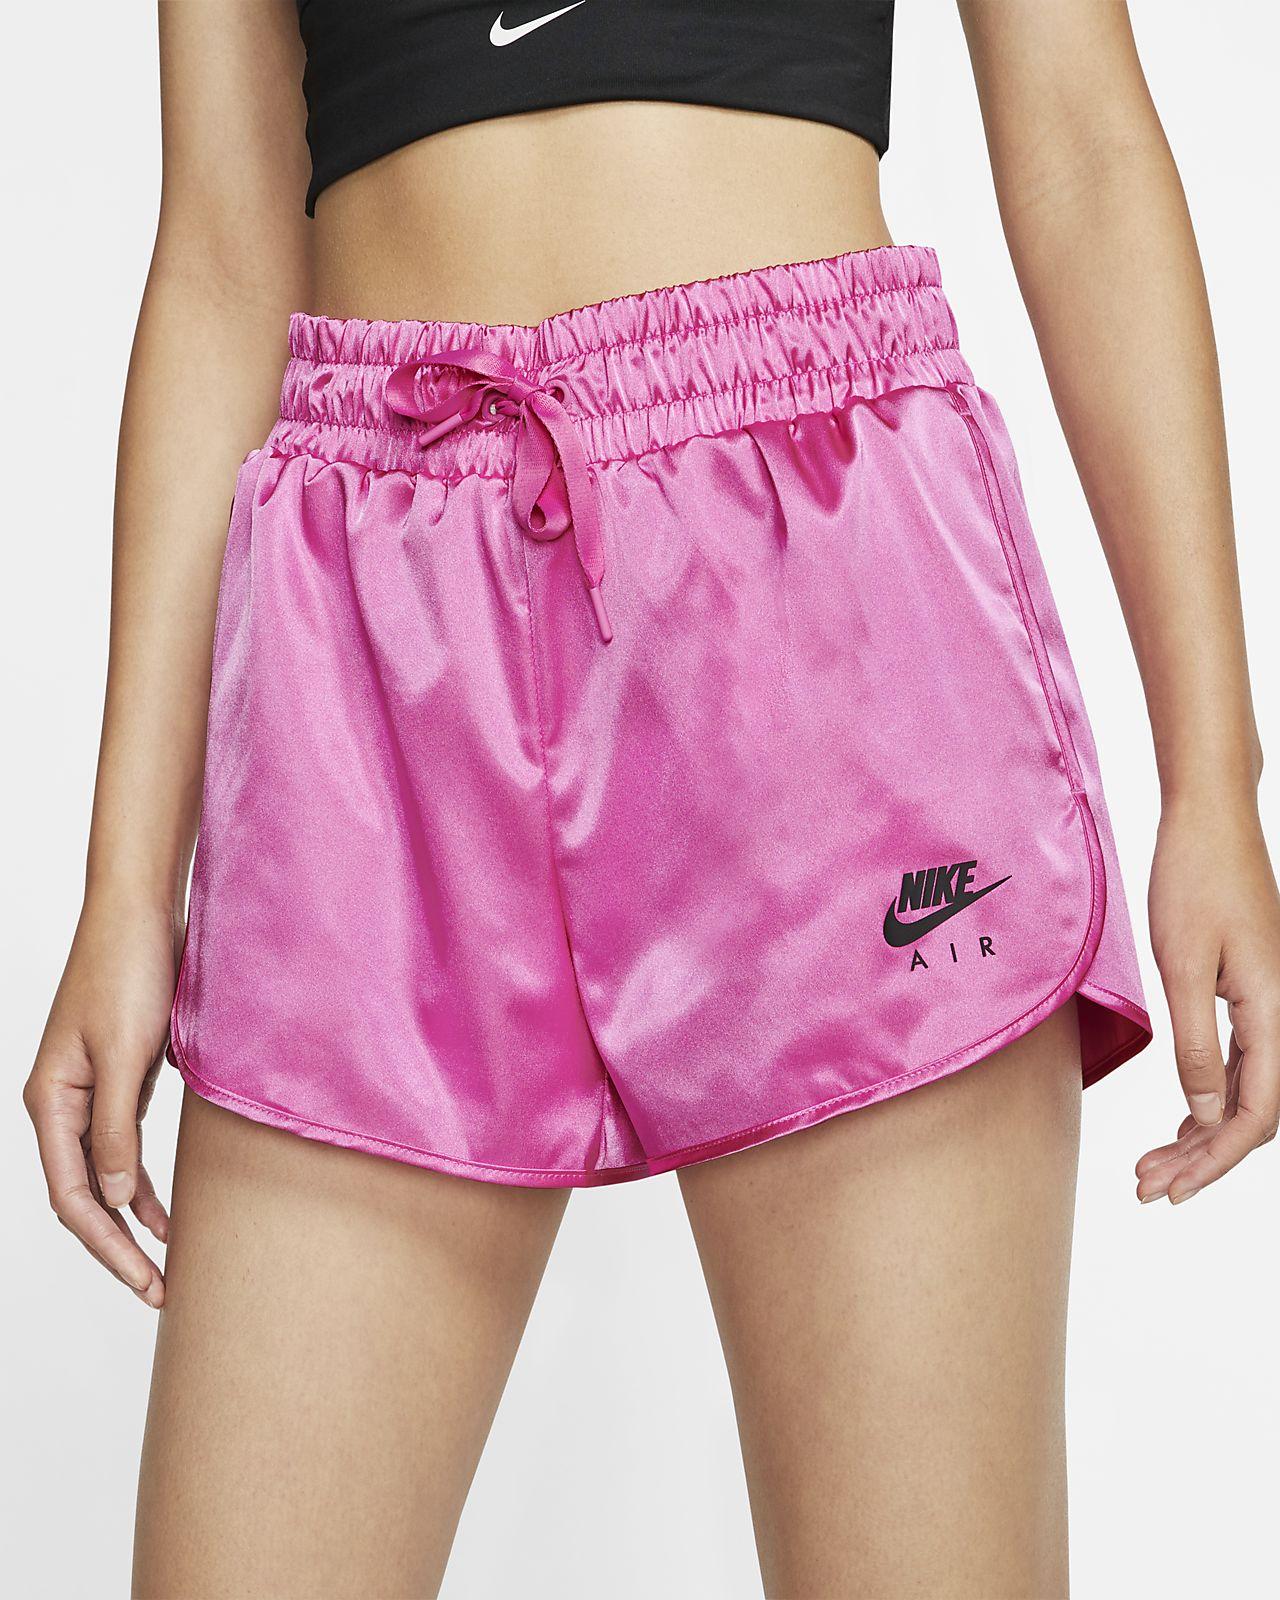 Nike Air Satin-Shorts für Damen